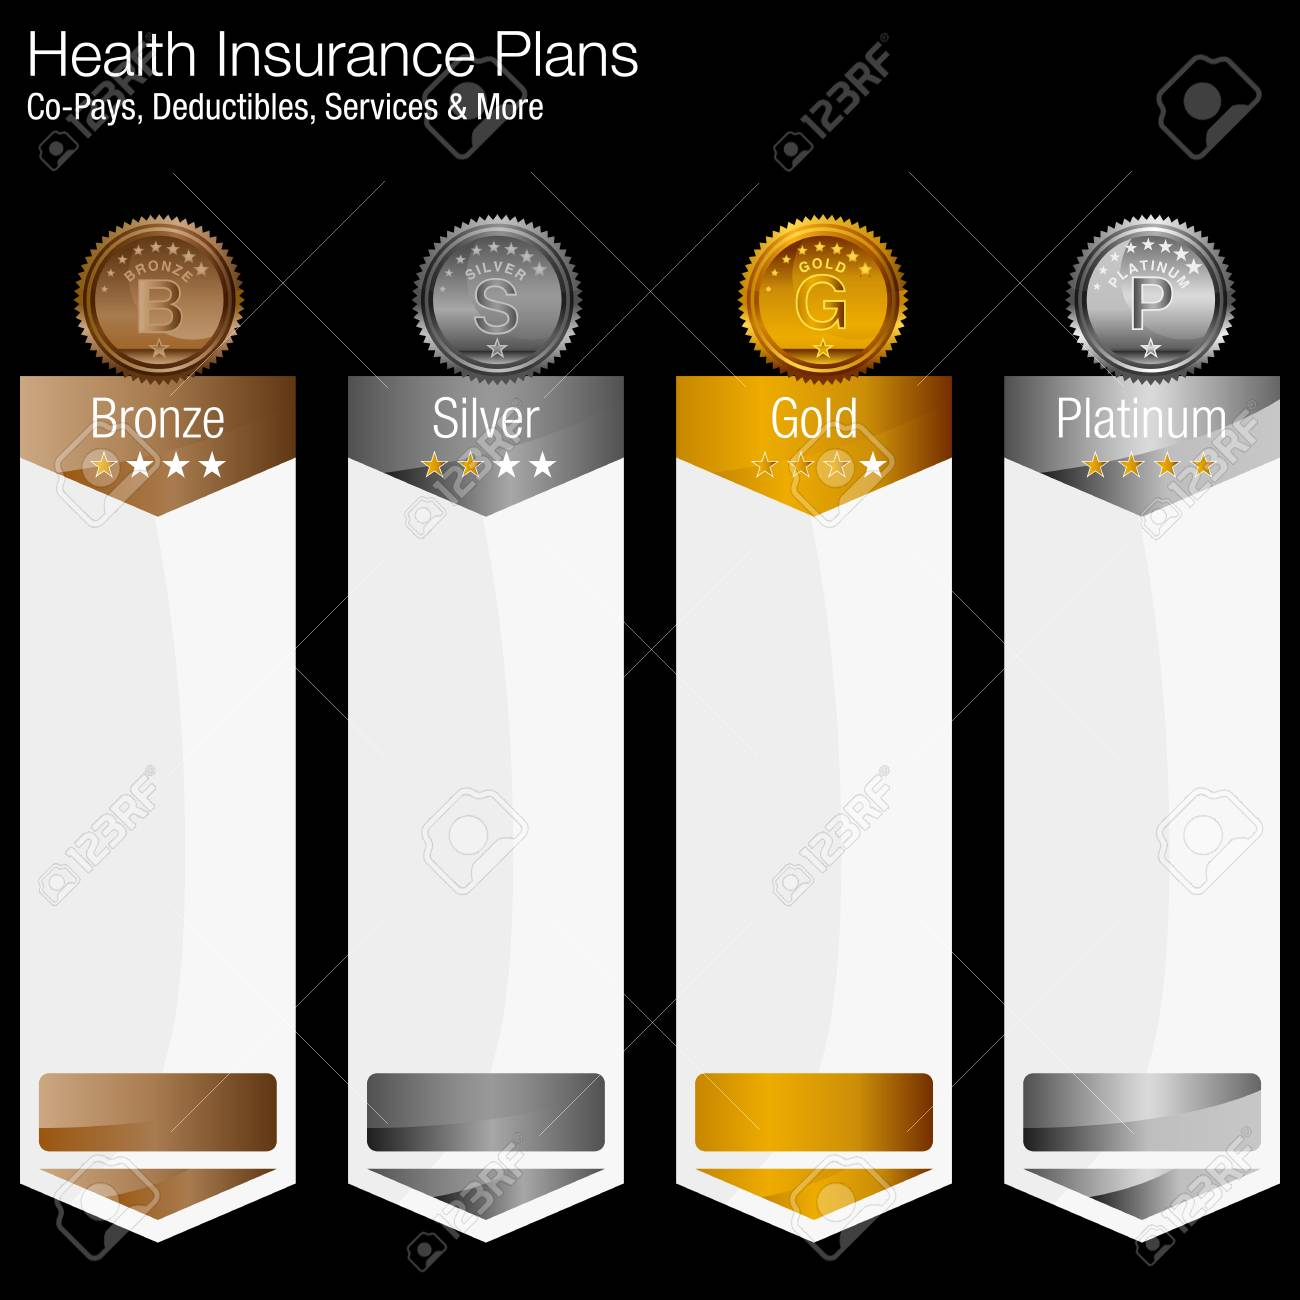 An image of a health insurance plan chart. - 96284712